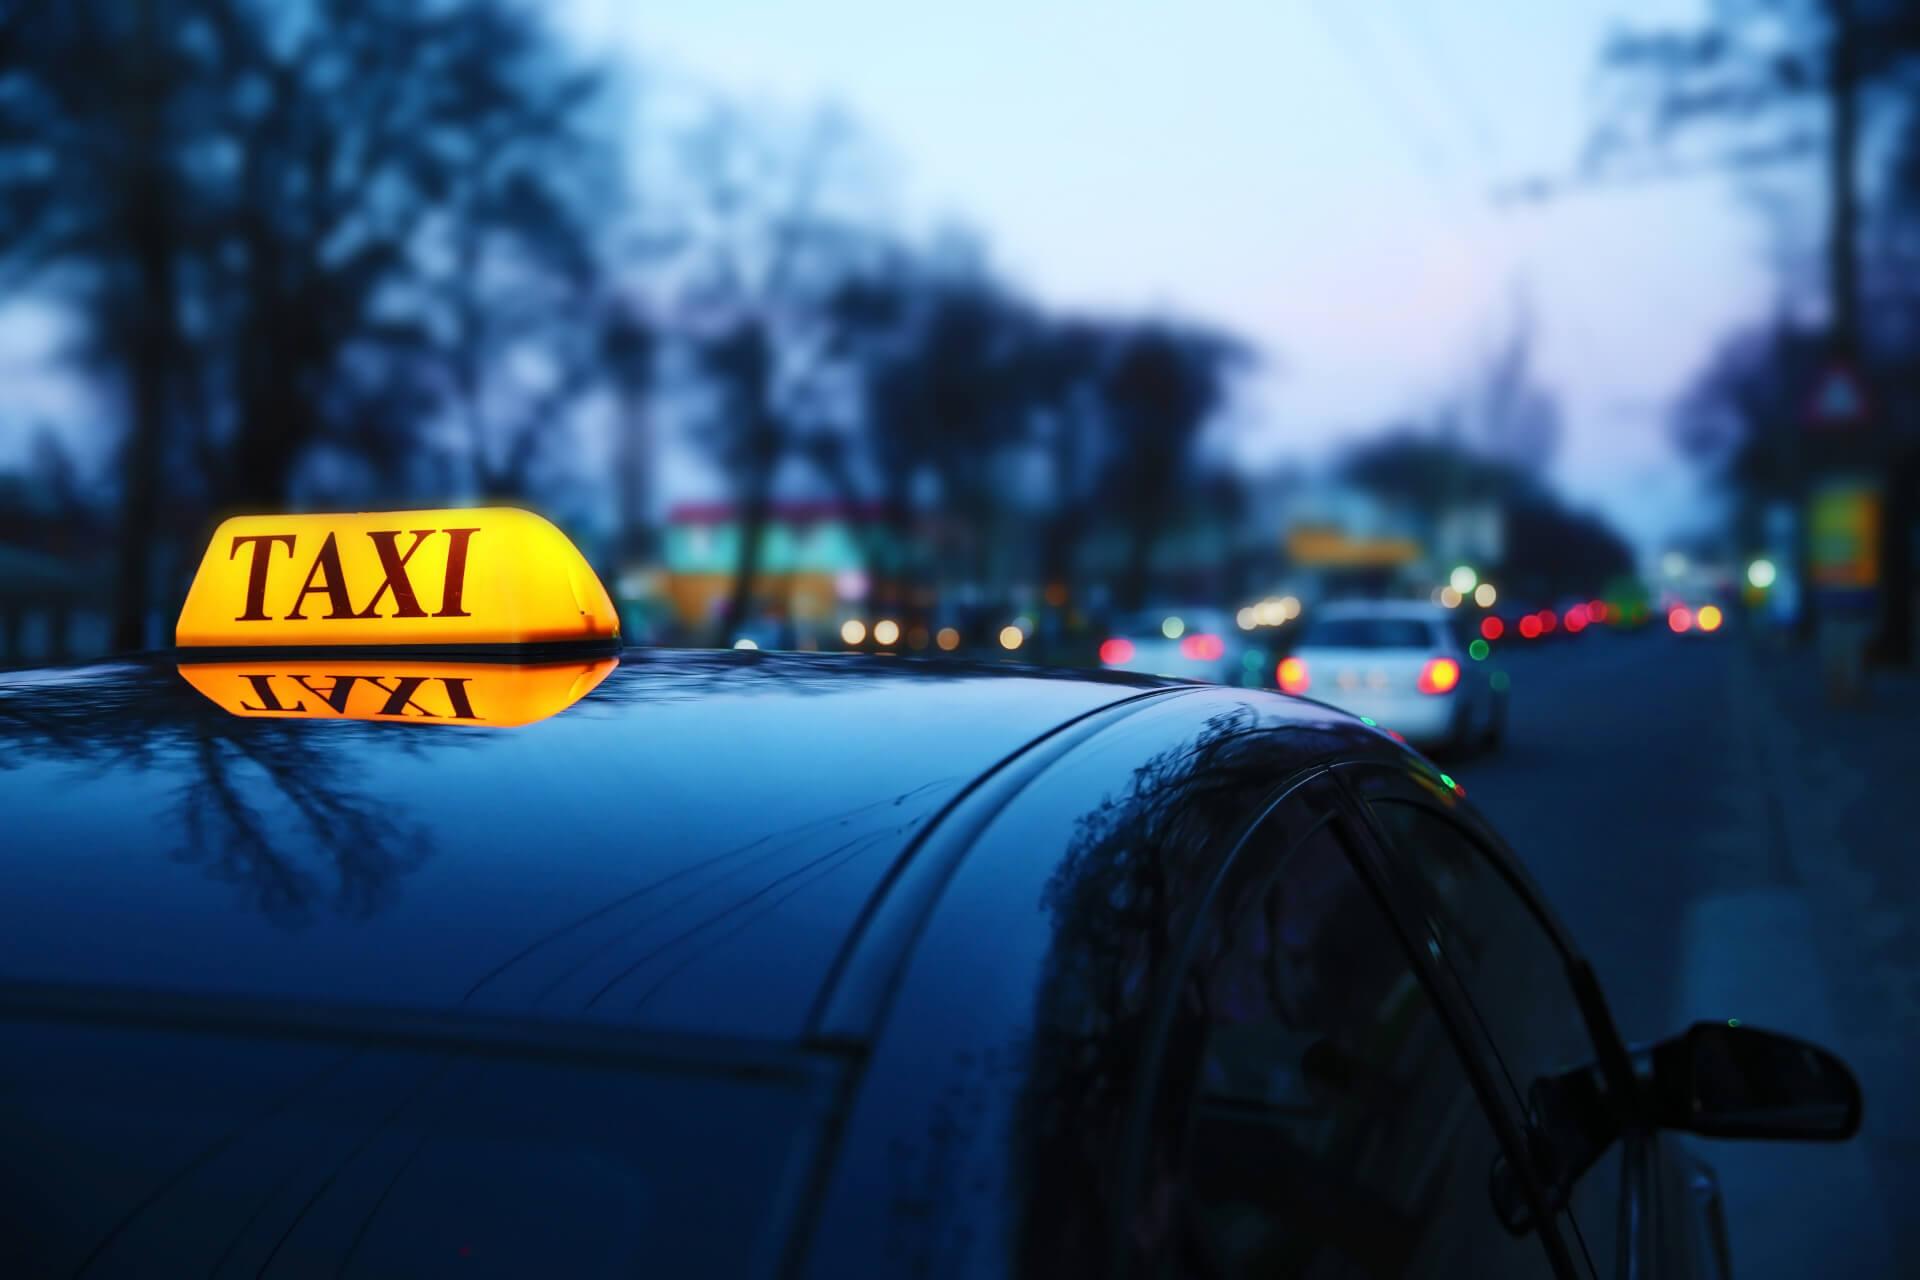 taxi cab on street